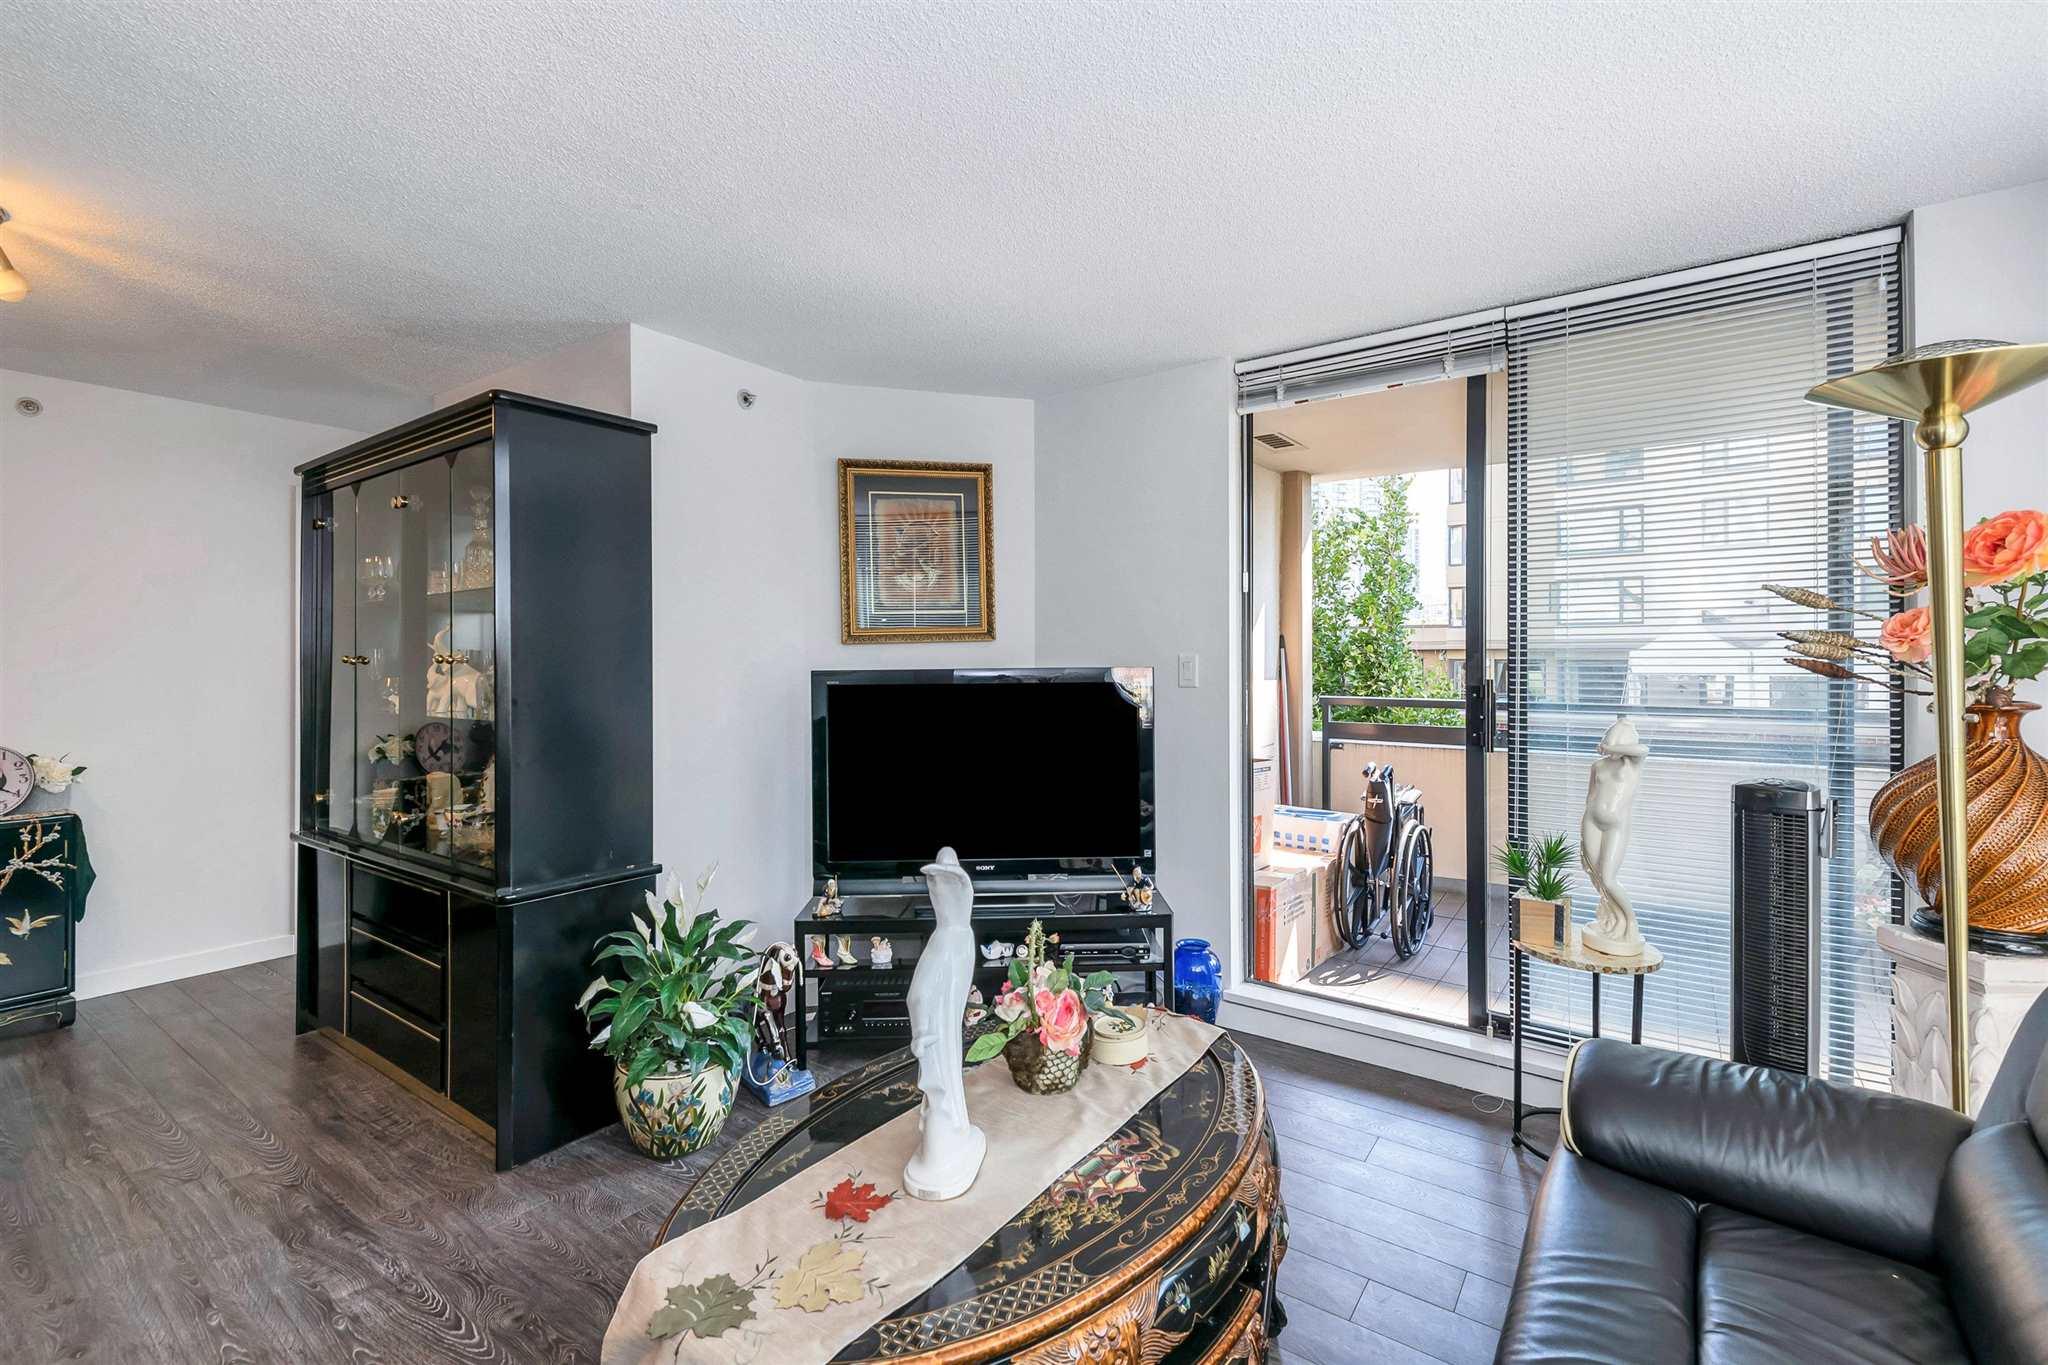 205 7225 ACORN AVENUE - Highgate Apartment/Condo for sale, 2 Bedrooms (R2606454) - #11